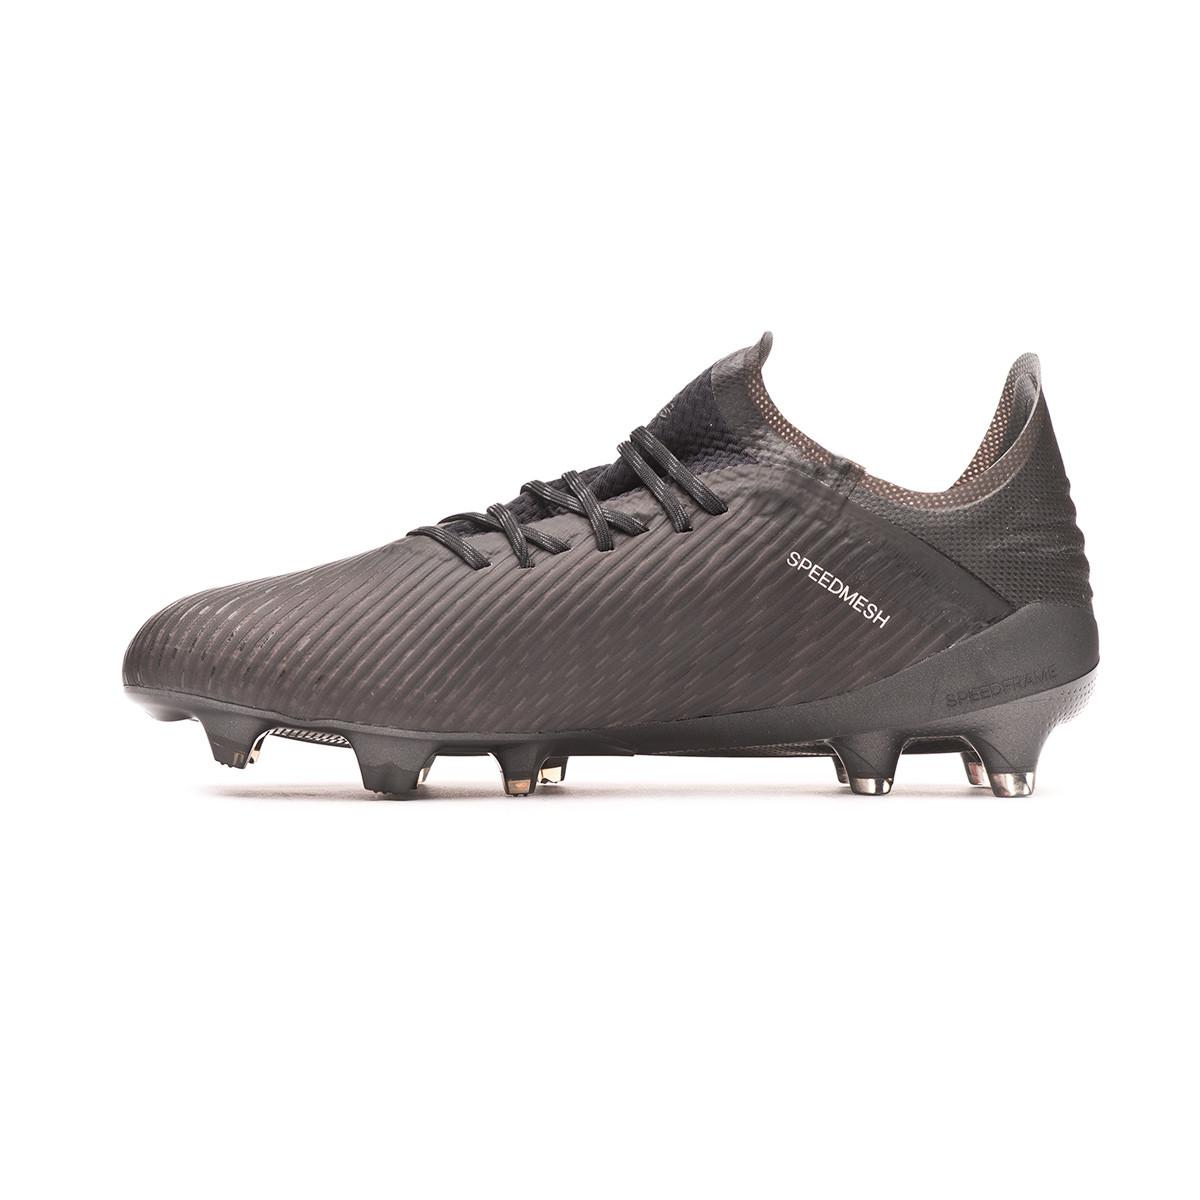 Scarpe adidas X 19.1 FG Core black Utility black Silver